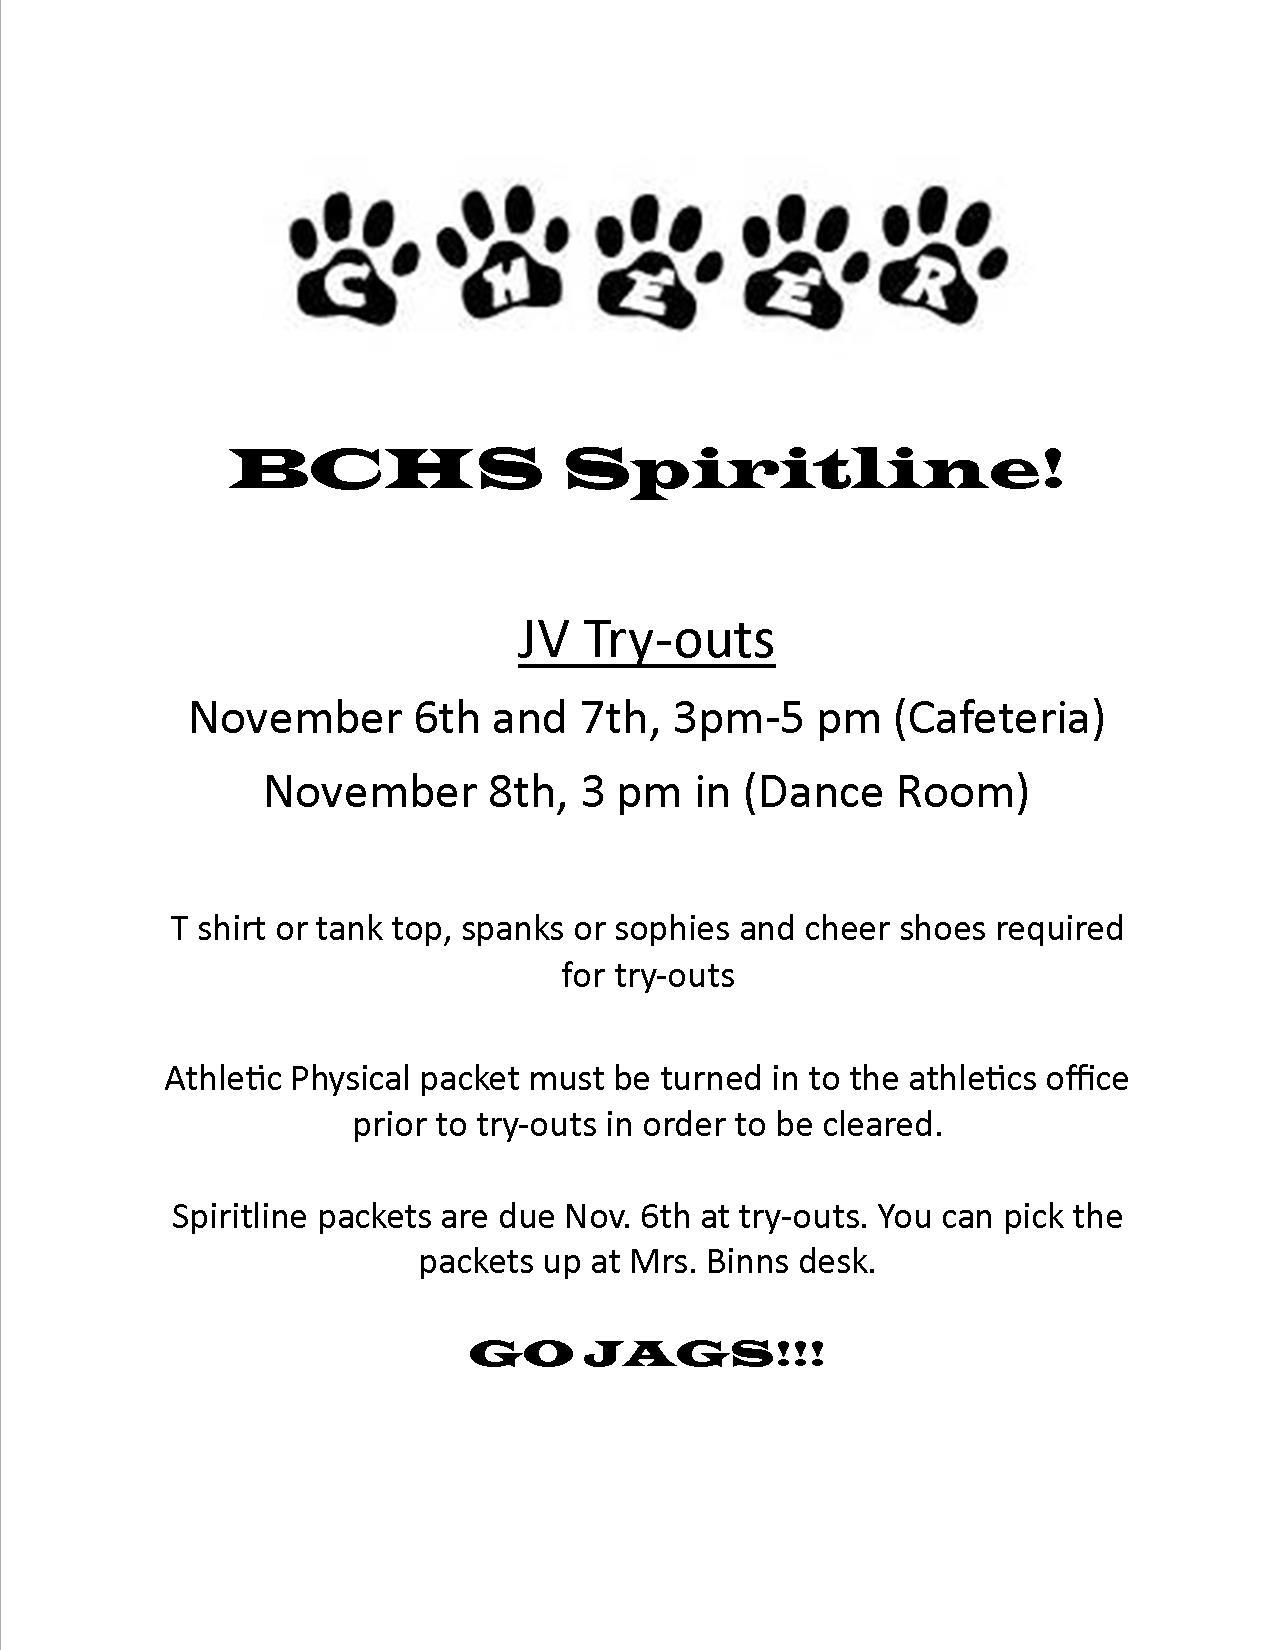 JV Spiritline Try-outs November 6th – 8th